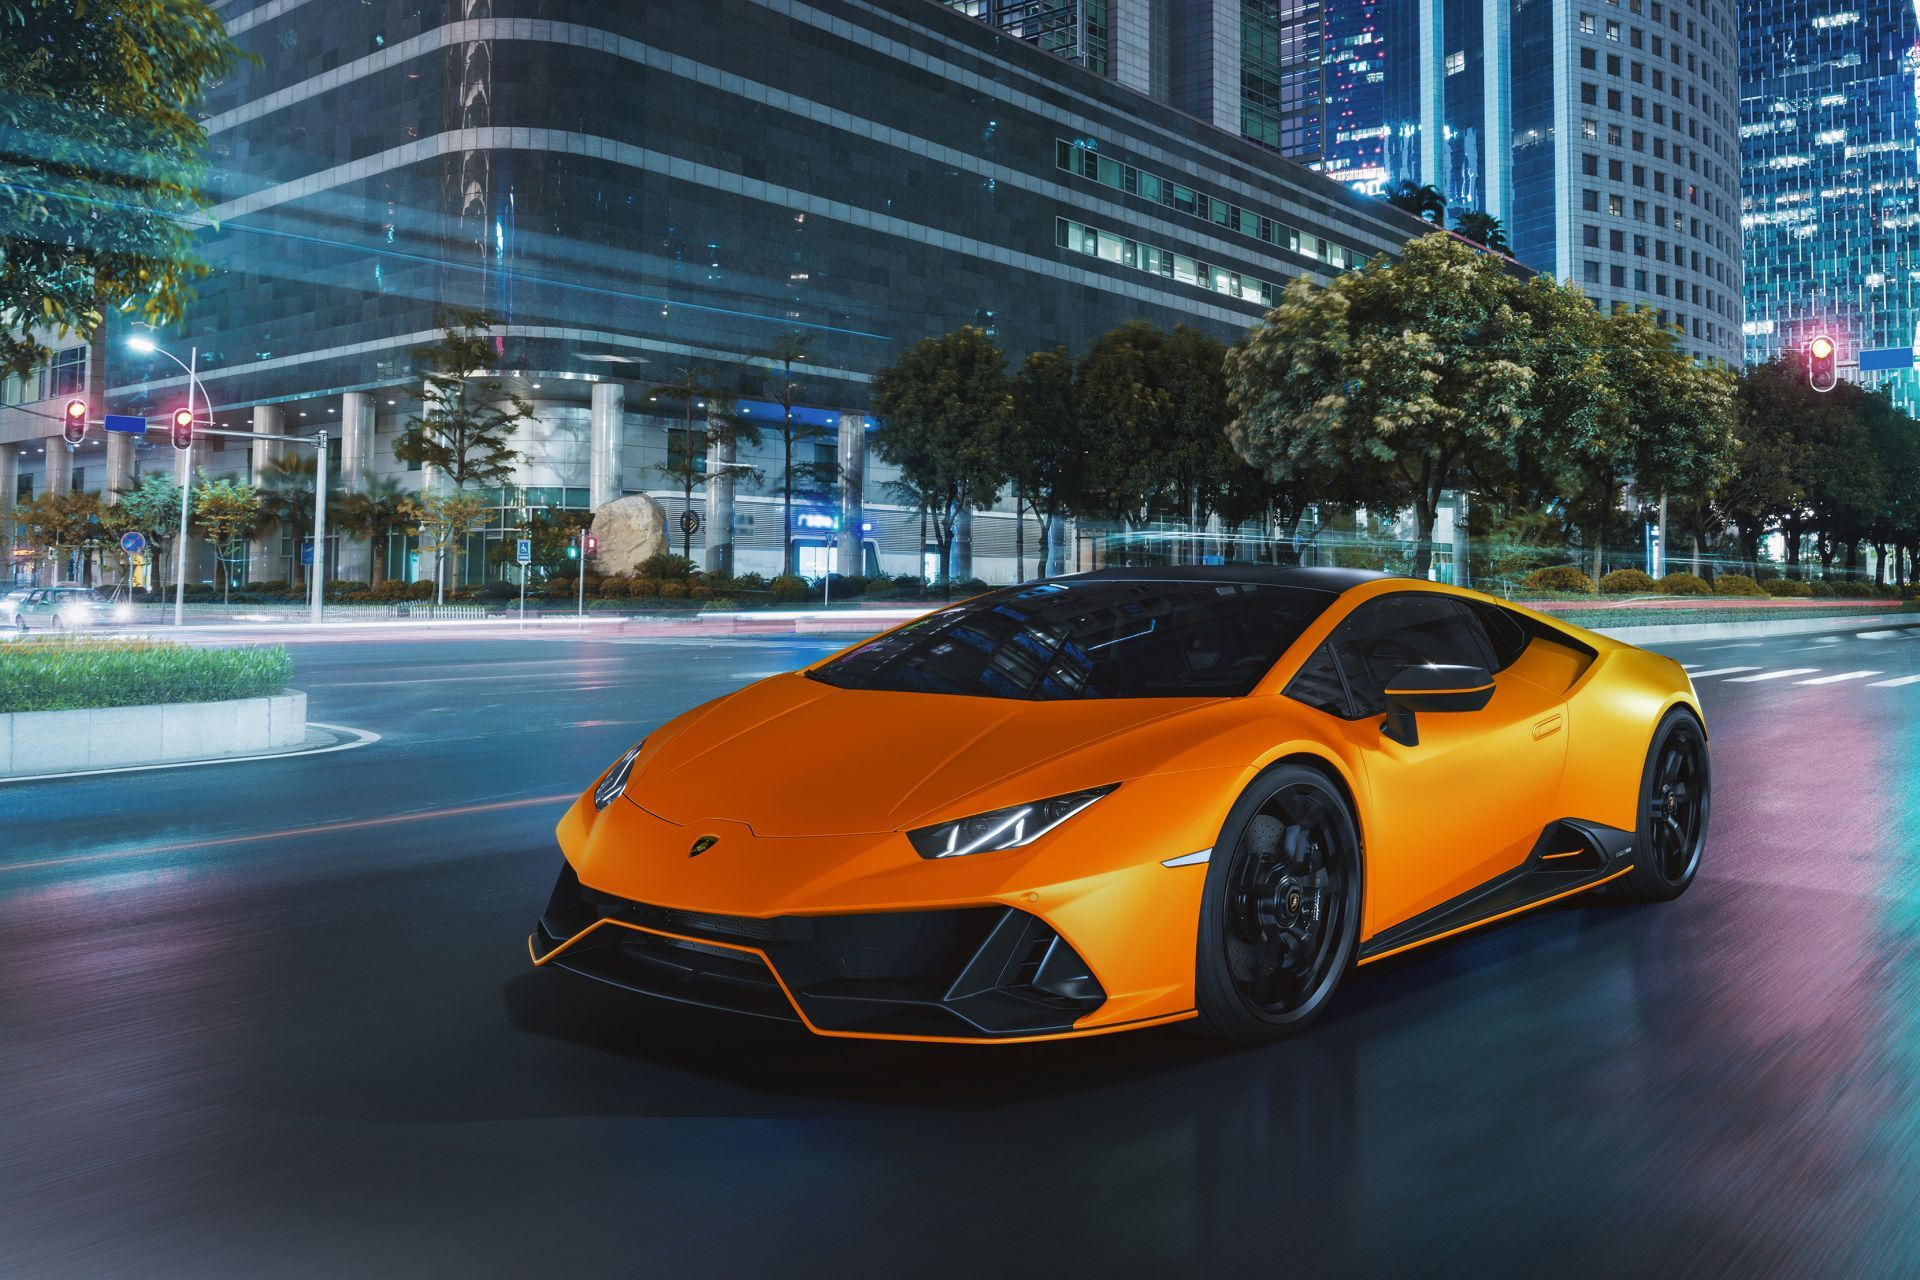 Lamborghini-Huracan-Evo-Fluo-Capsule-18